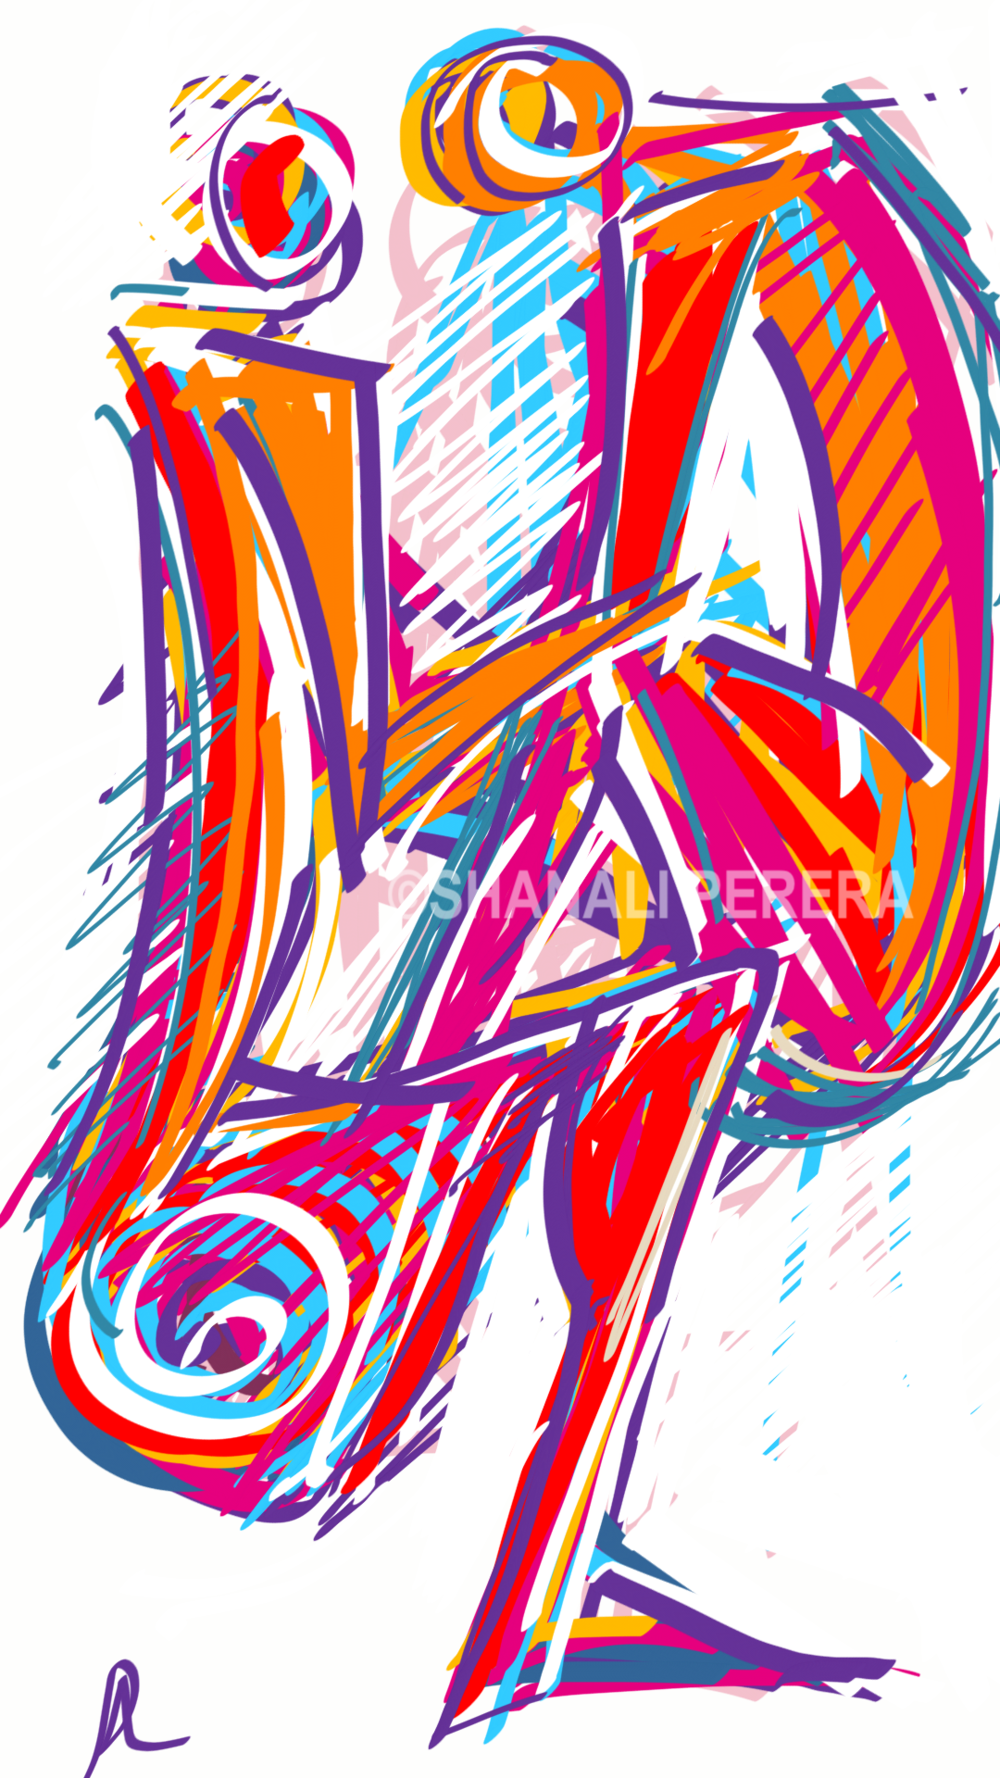 sketch-1518962104448.png